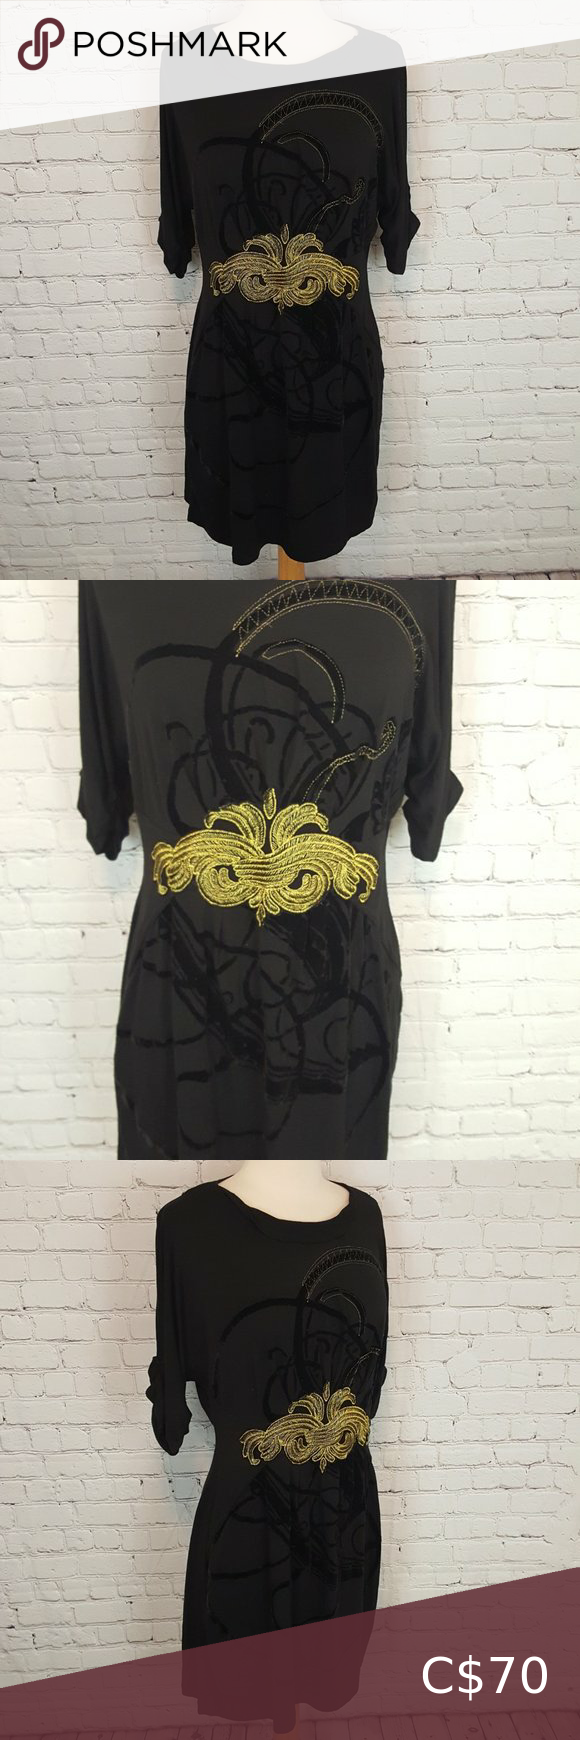 Desigual By Christian Lacroix Black Gold Dress L Size L Bust 38 Waist 30 Hips 36 Length 34 Raised Gold A Gold And Black Dress Gold Dress Desigual [ 1740 x 580 Pixel ]